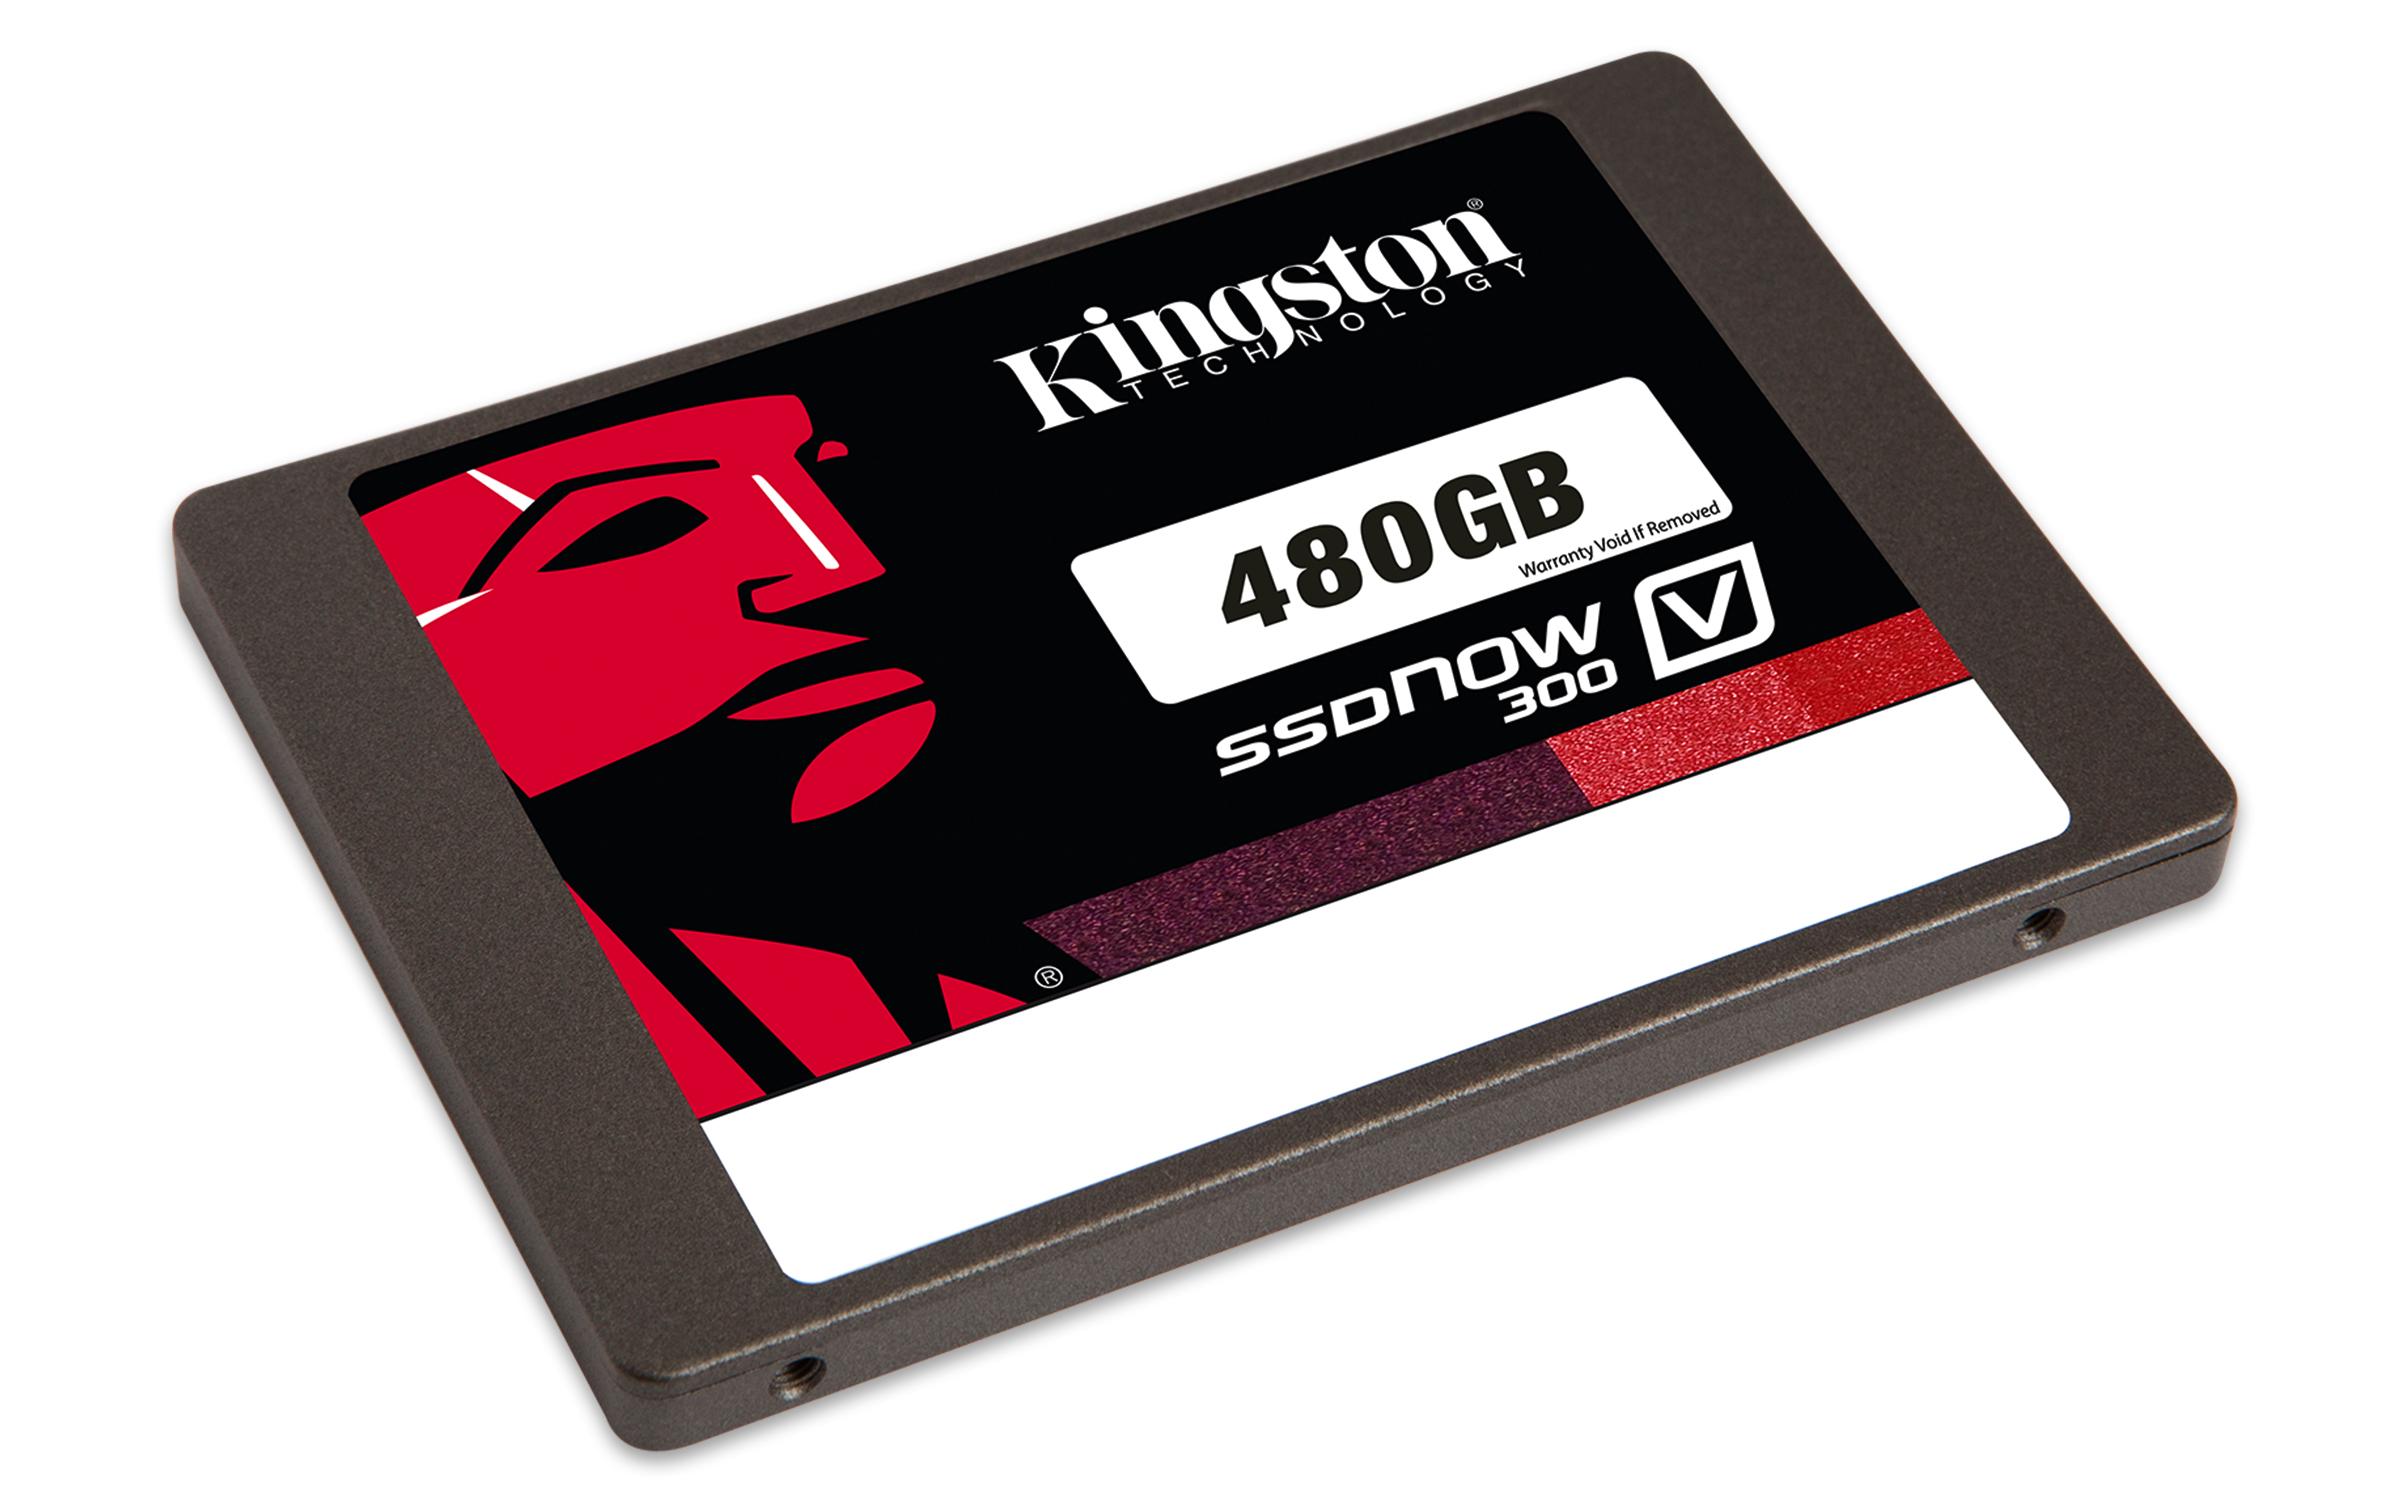 【Kingston 金士頓】V300 2.5吋 SATAⅢSSD 固態硬碟